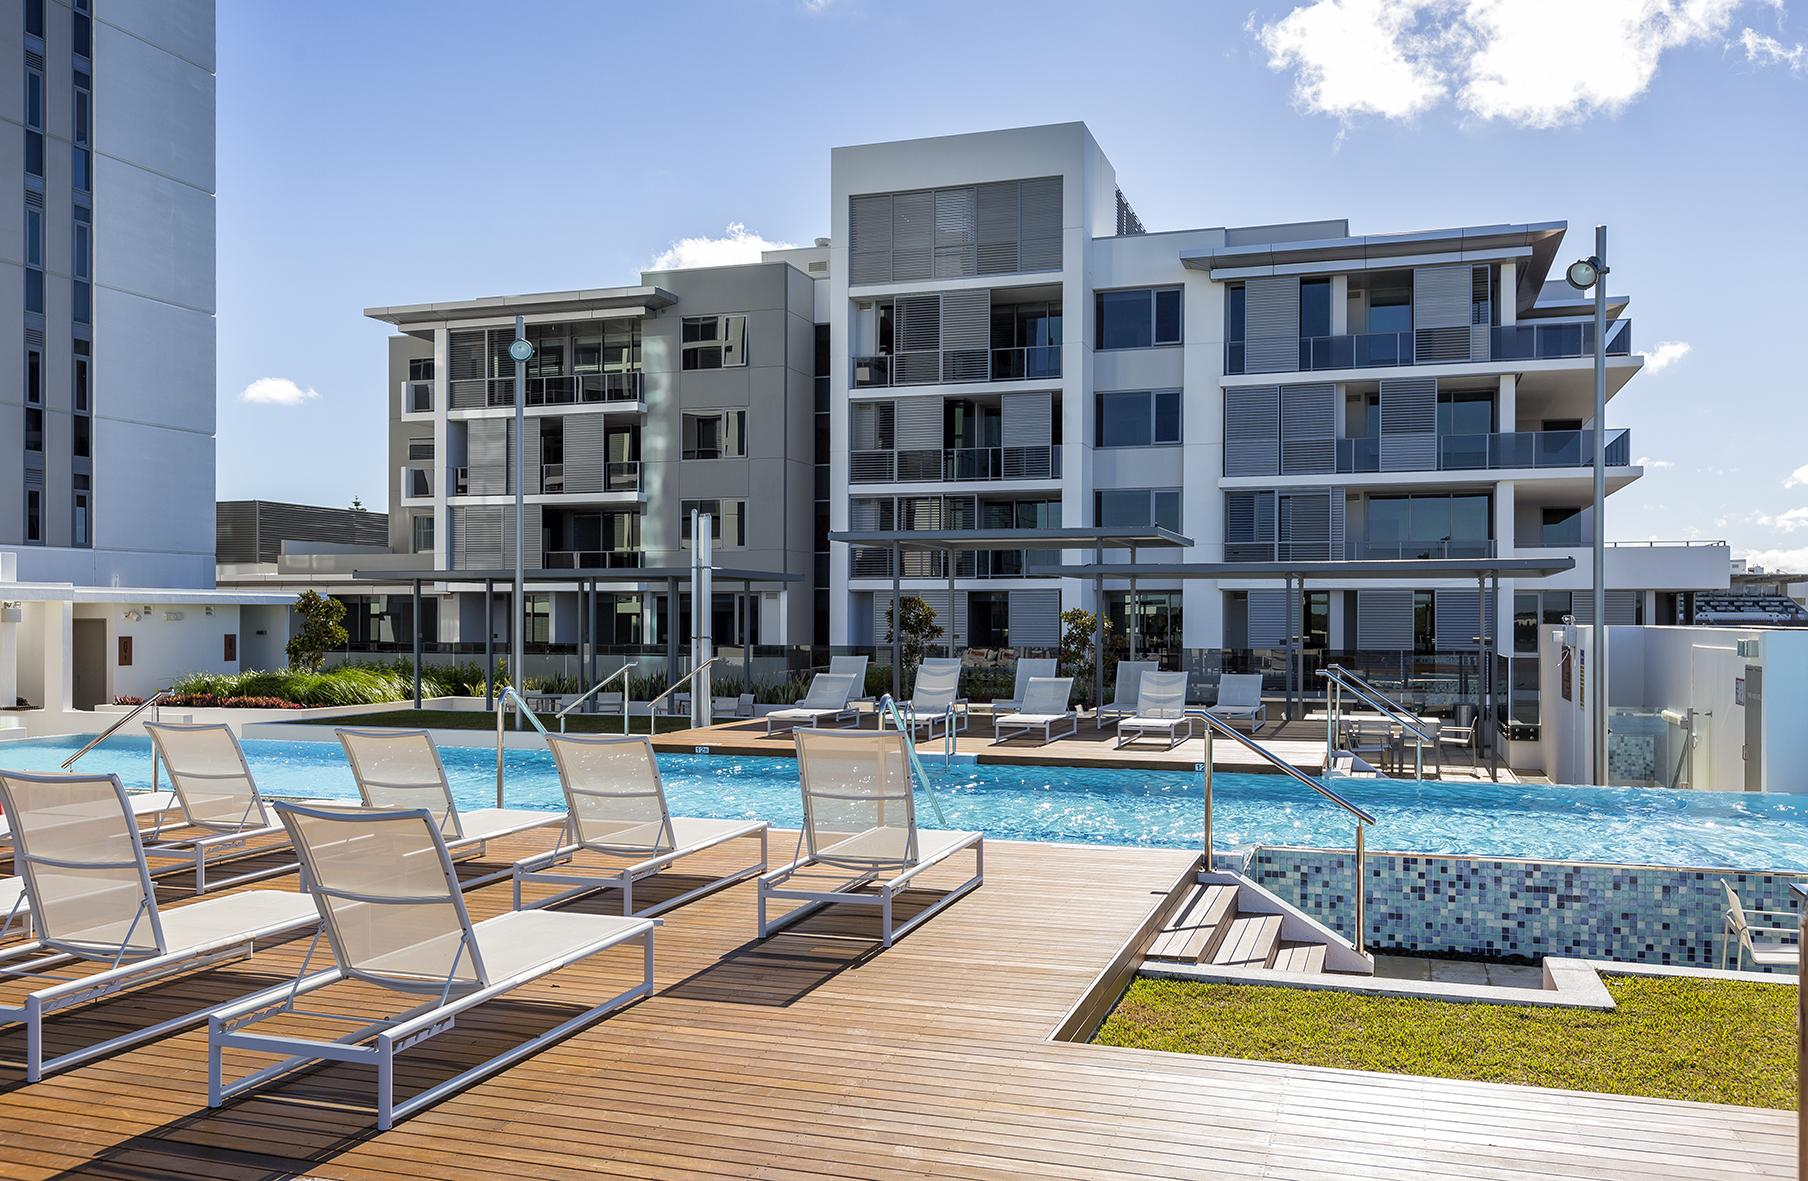 Corporate Serviced Apartments In Perth, Australia - SilverDoor